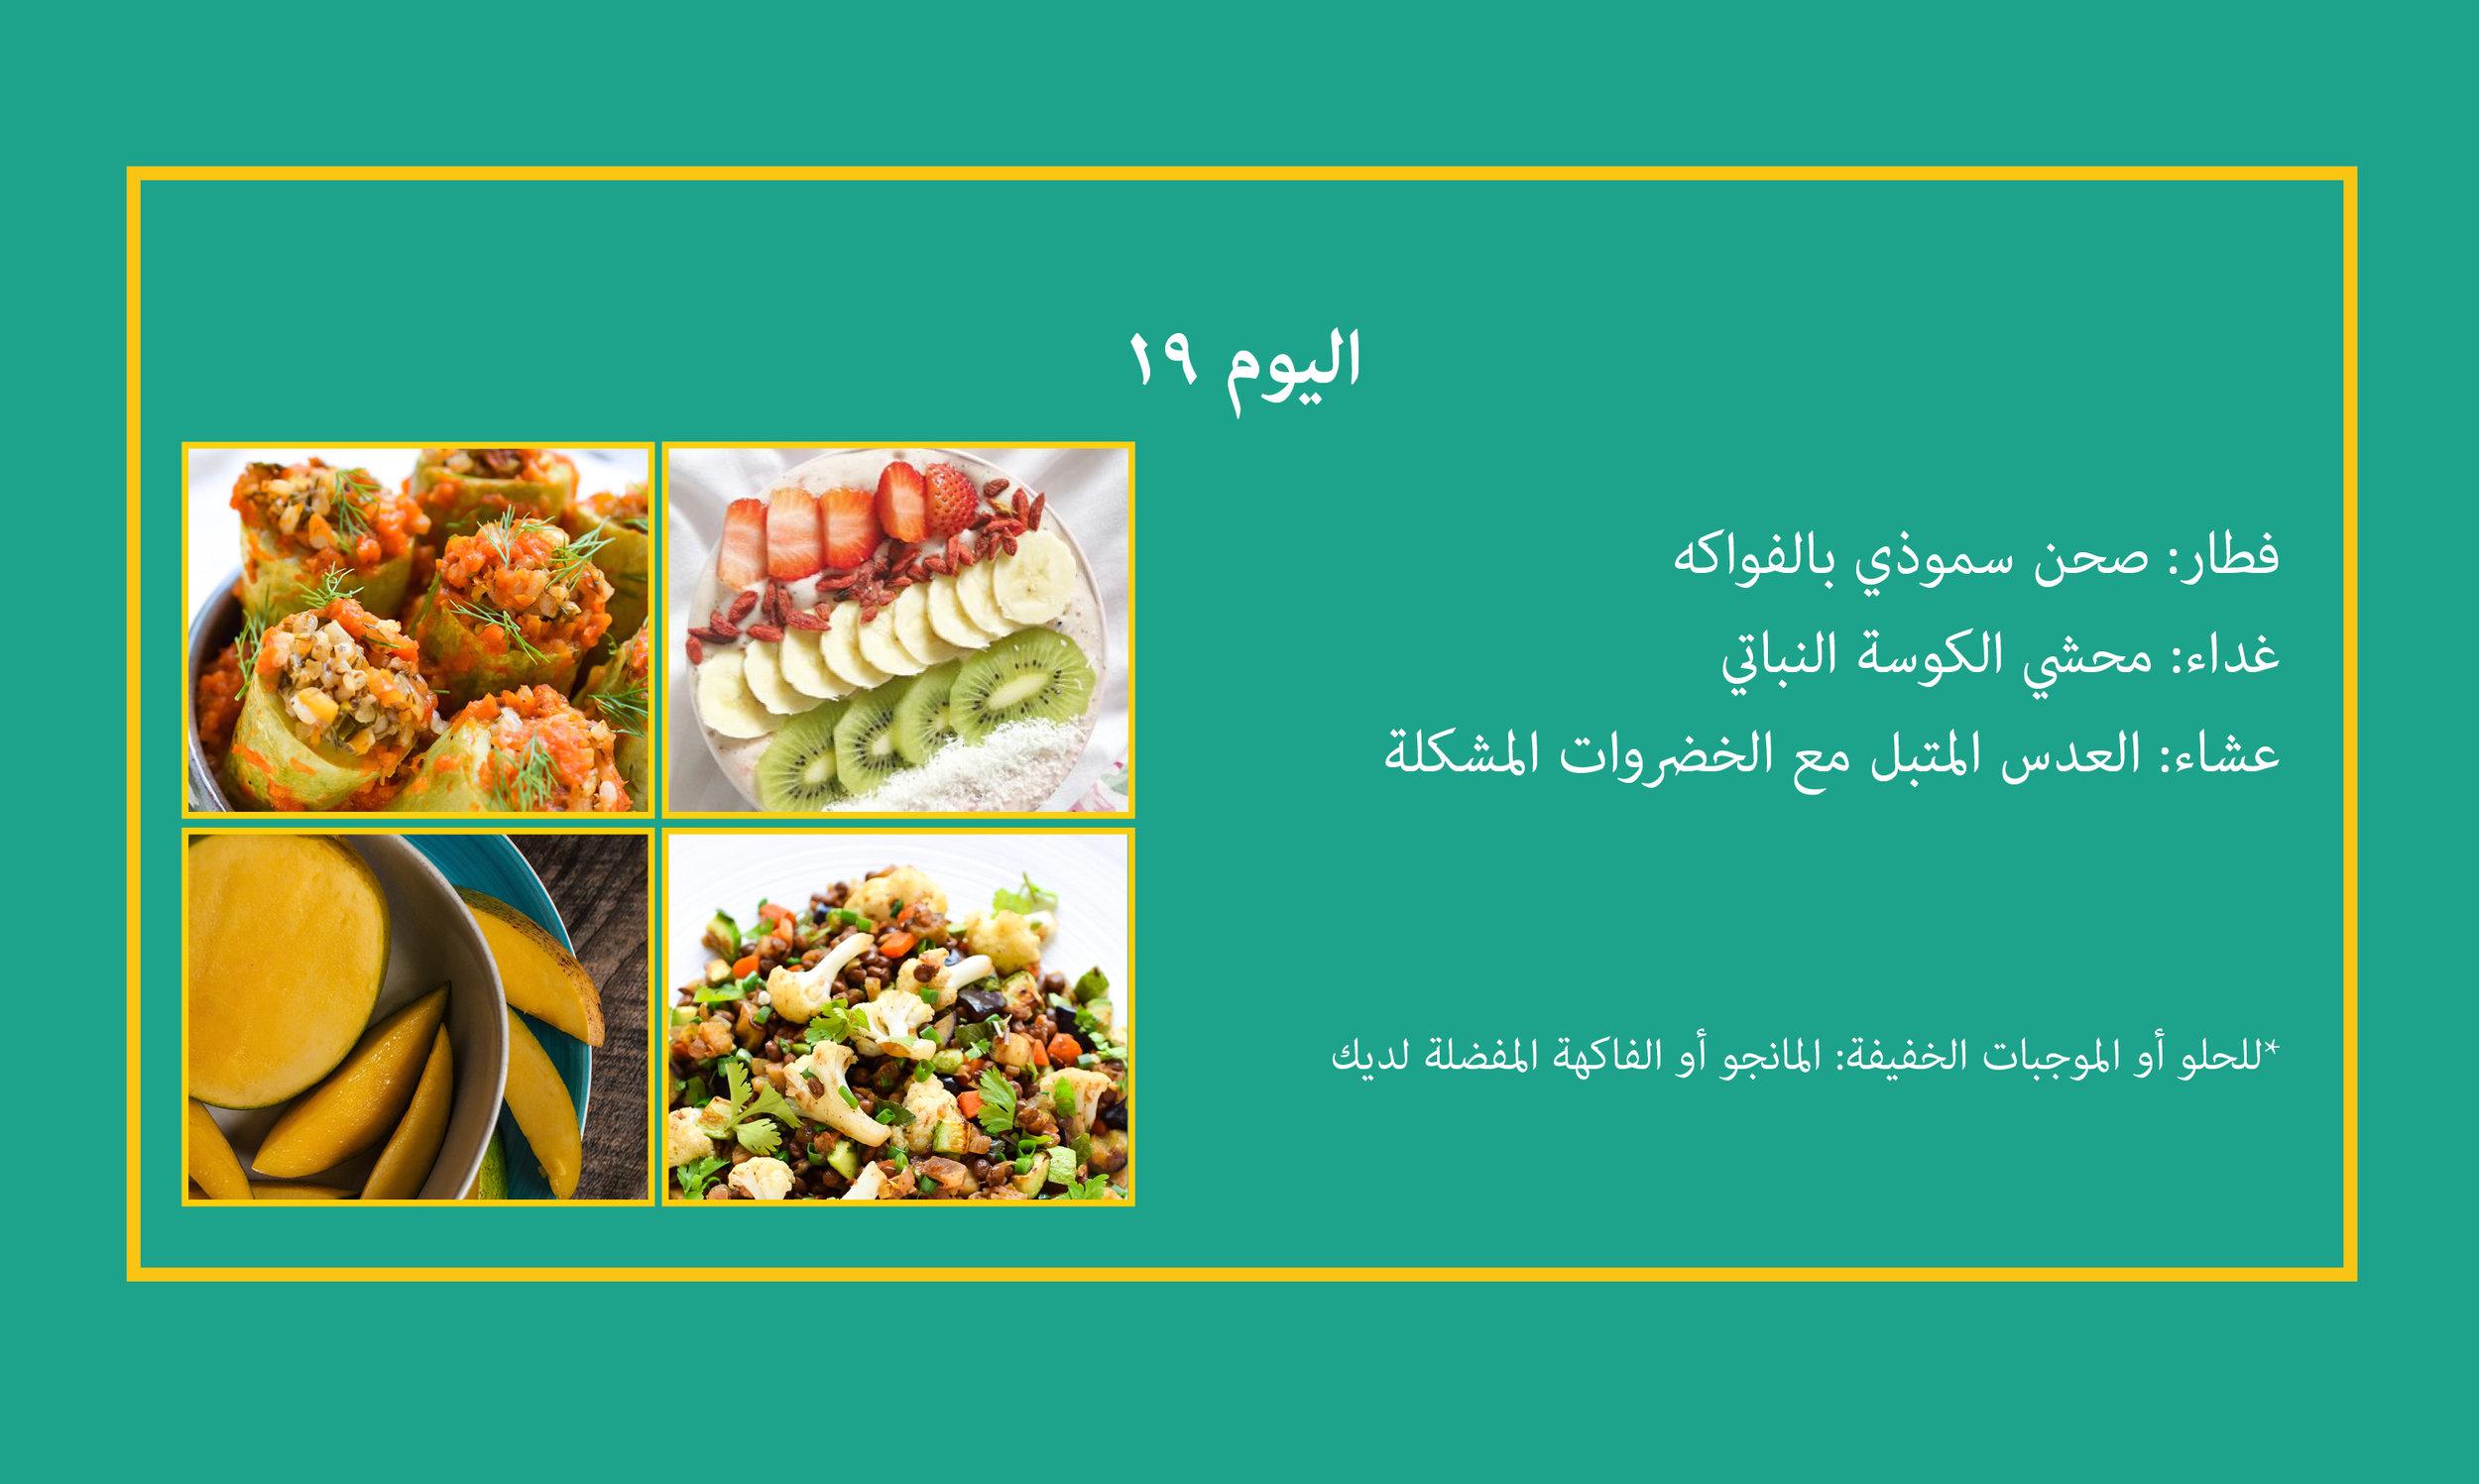 Day 19 Arabic.jpg